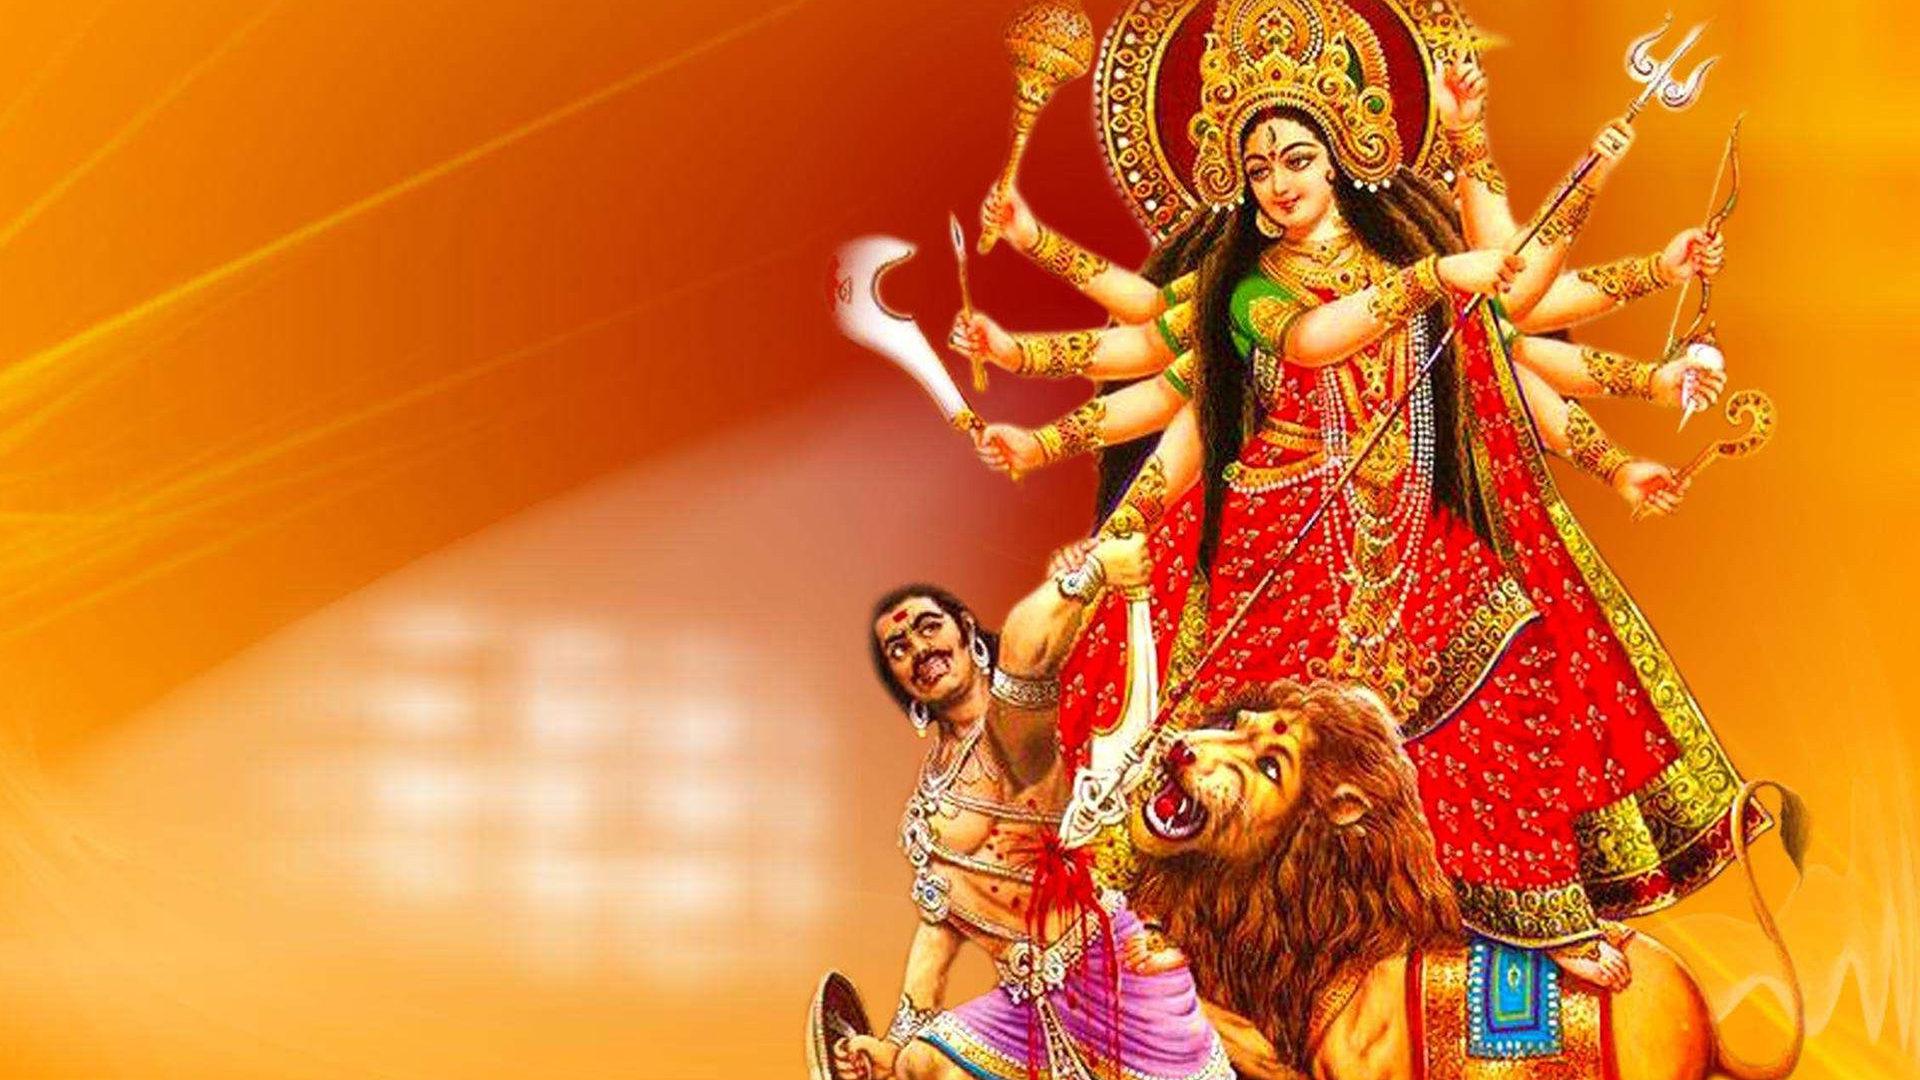 Maa Durga Wallpaper 3d Maa Durga Images Best Images For Desktop Hd Wallpaper